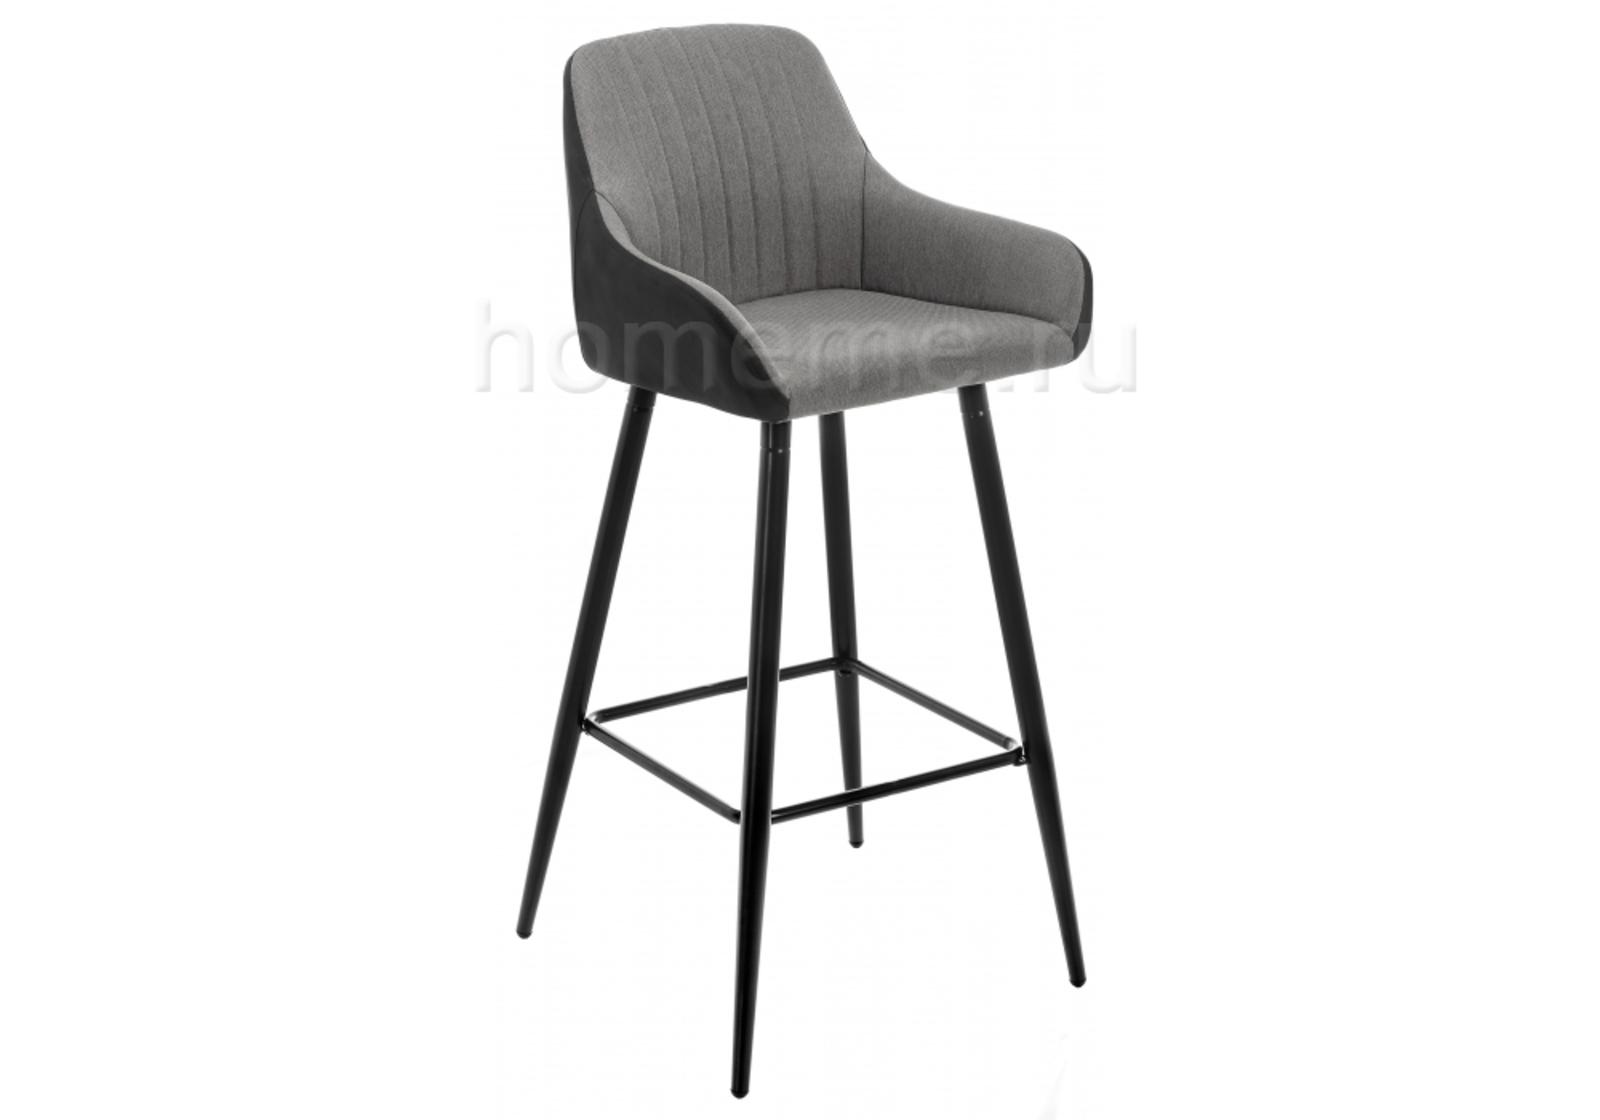 Барный стул Haris серый 11534 Haris серый 11534 (18293)